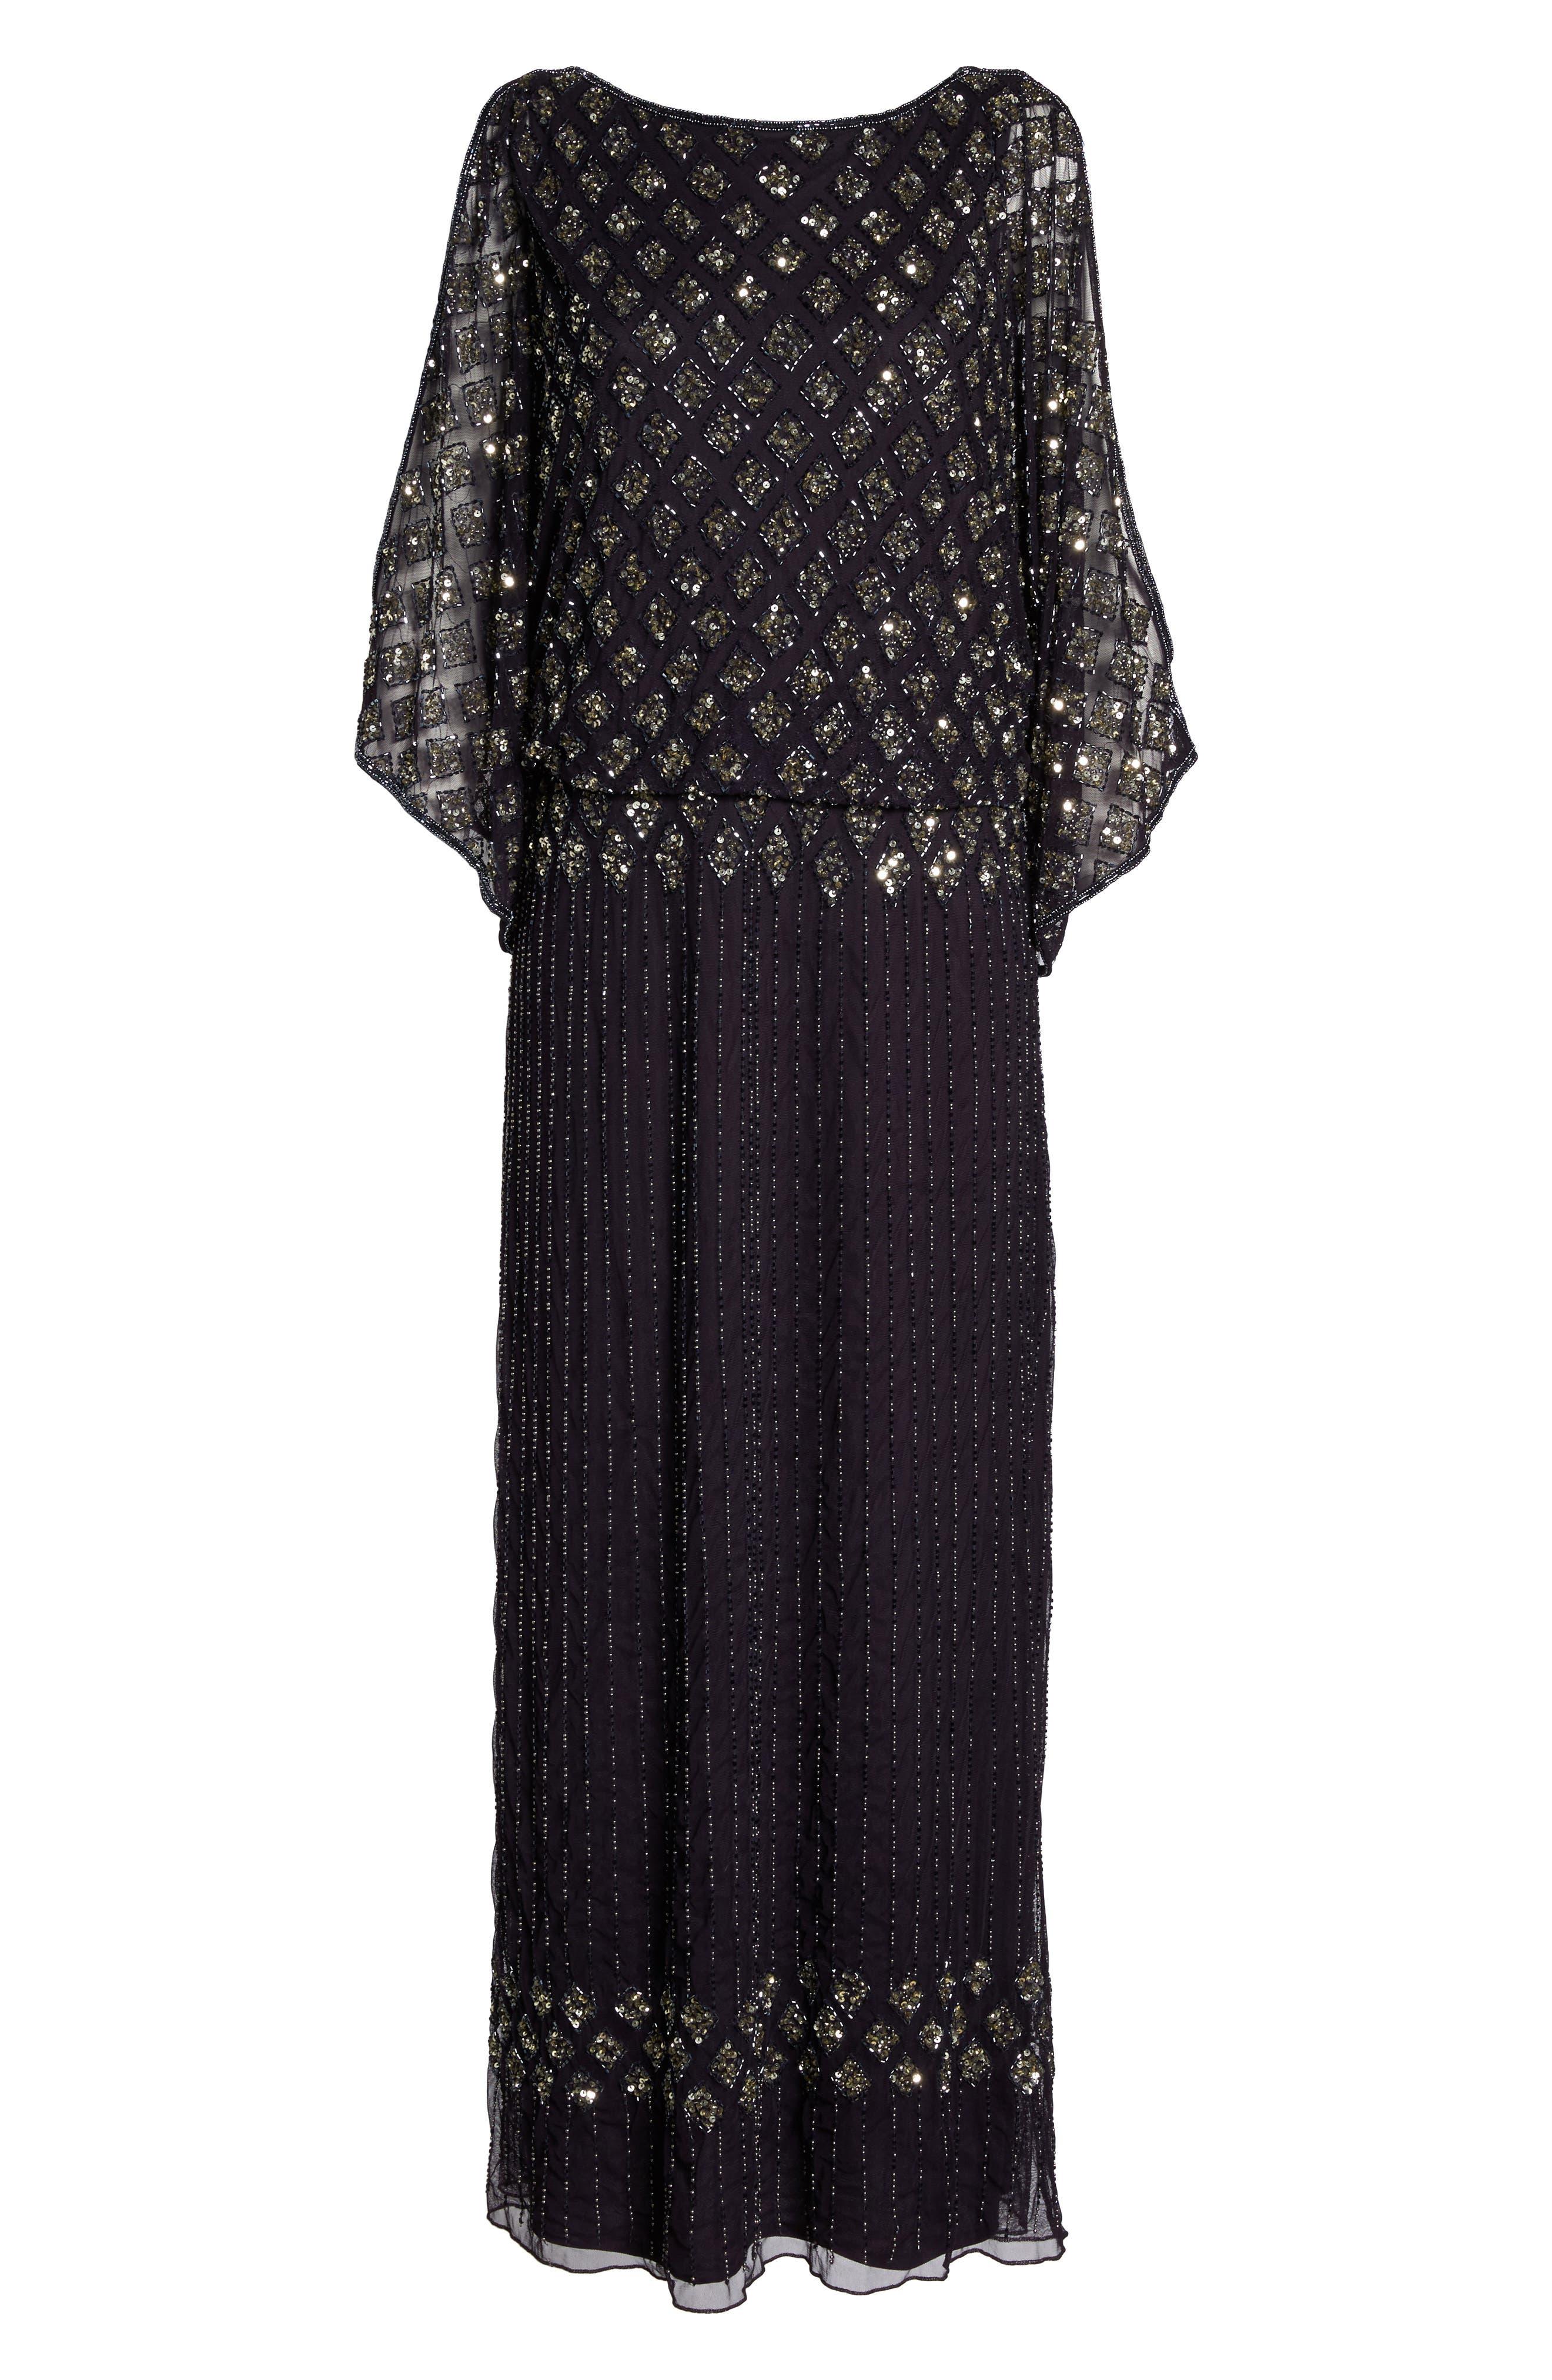 PISARRO NIGHTS, Diamond Motif Mesh Blouson Gown, Alternate thumbnail 7, color, 503